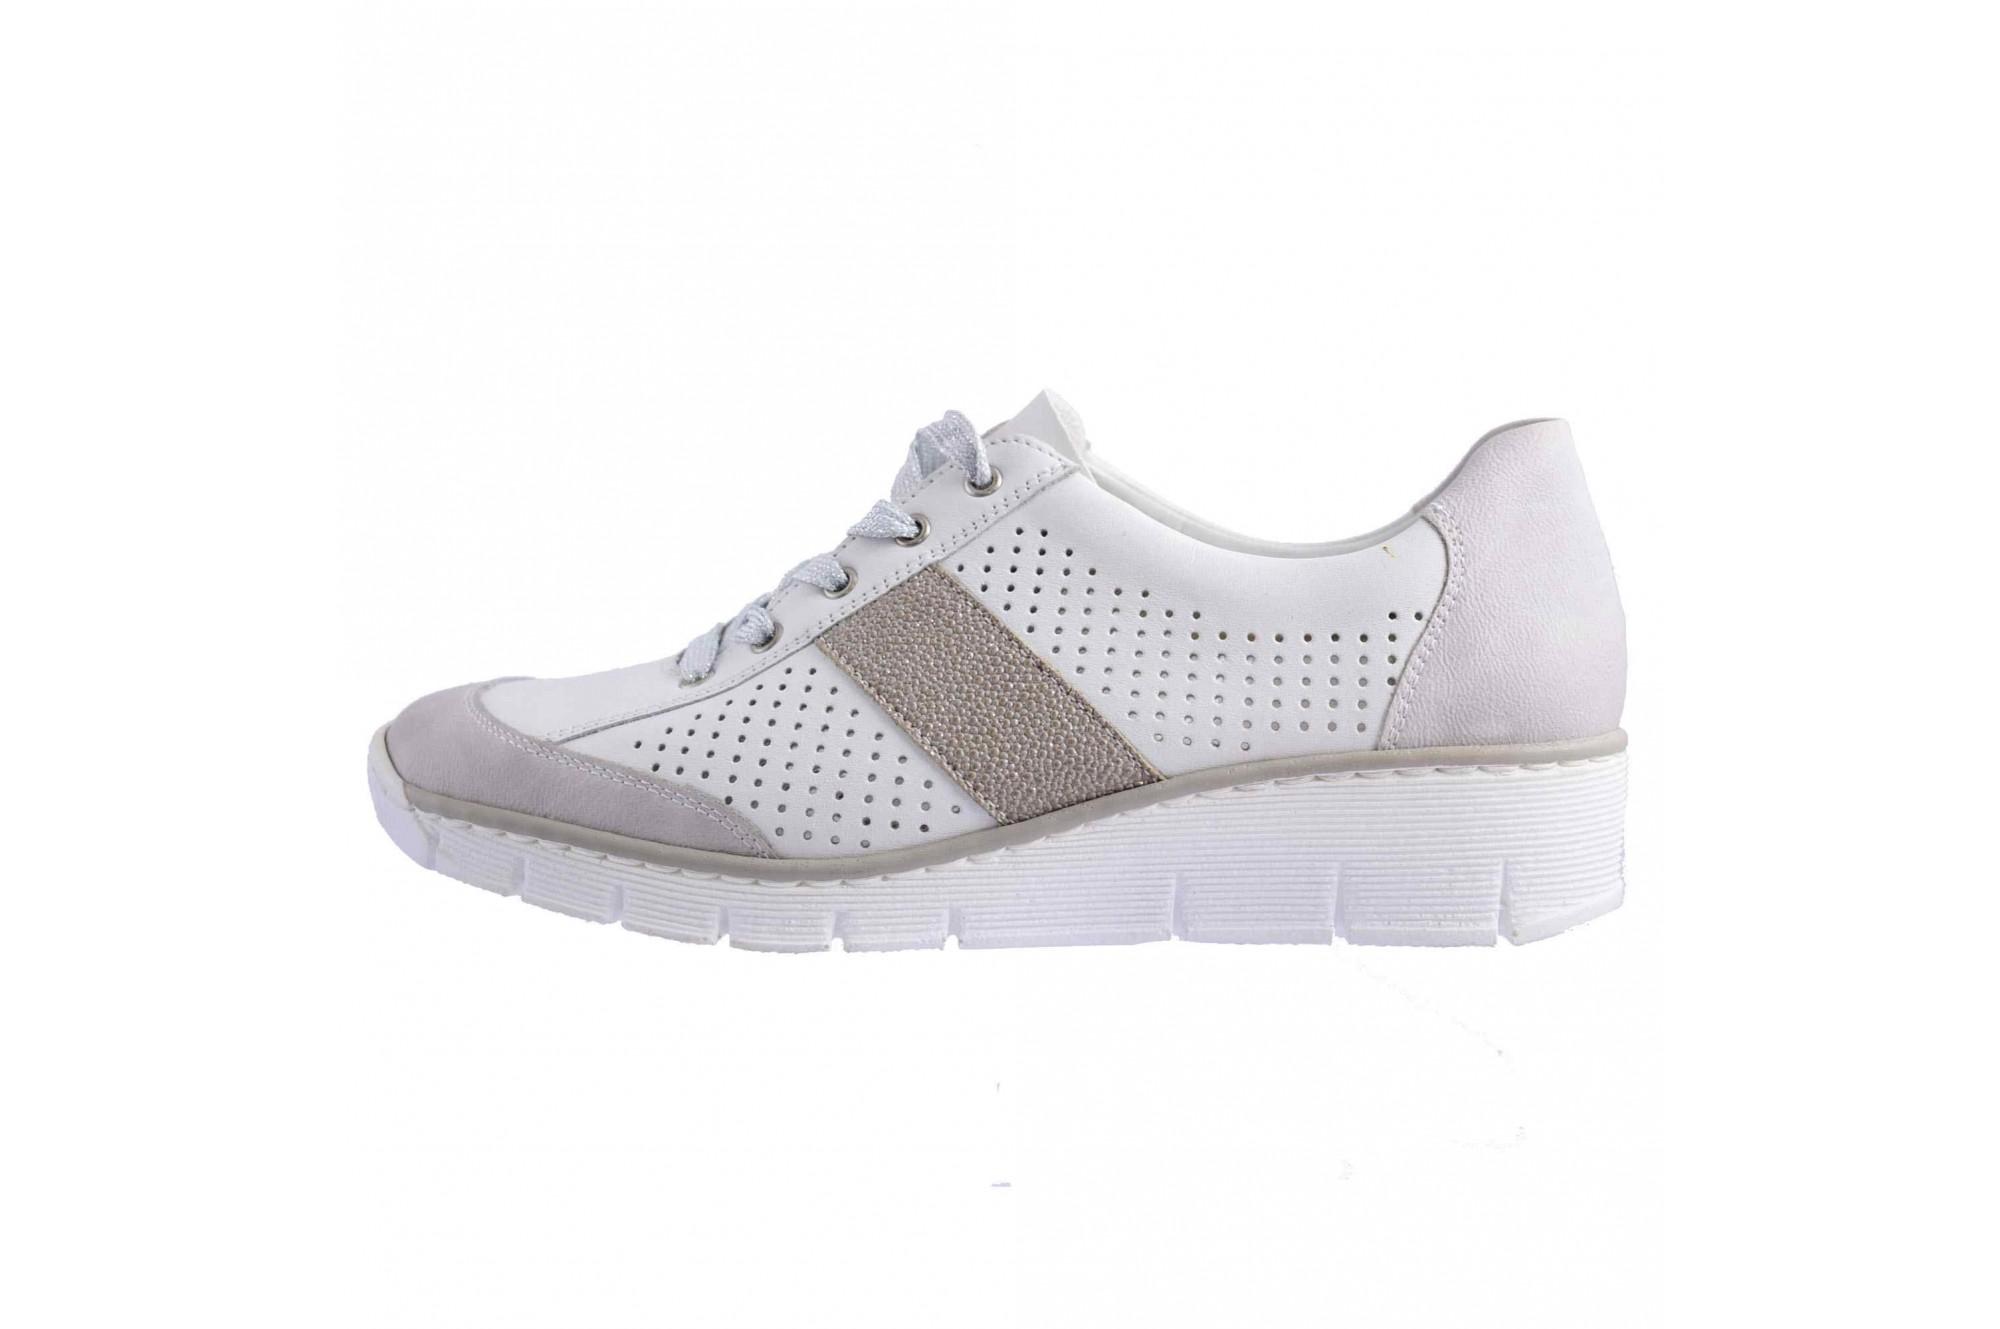 100% calitate cumpara popular pantofi de temperament pantofi sport rieker piele naturala alb psd53717